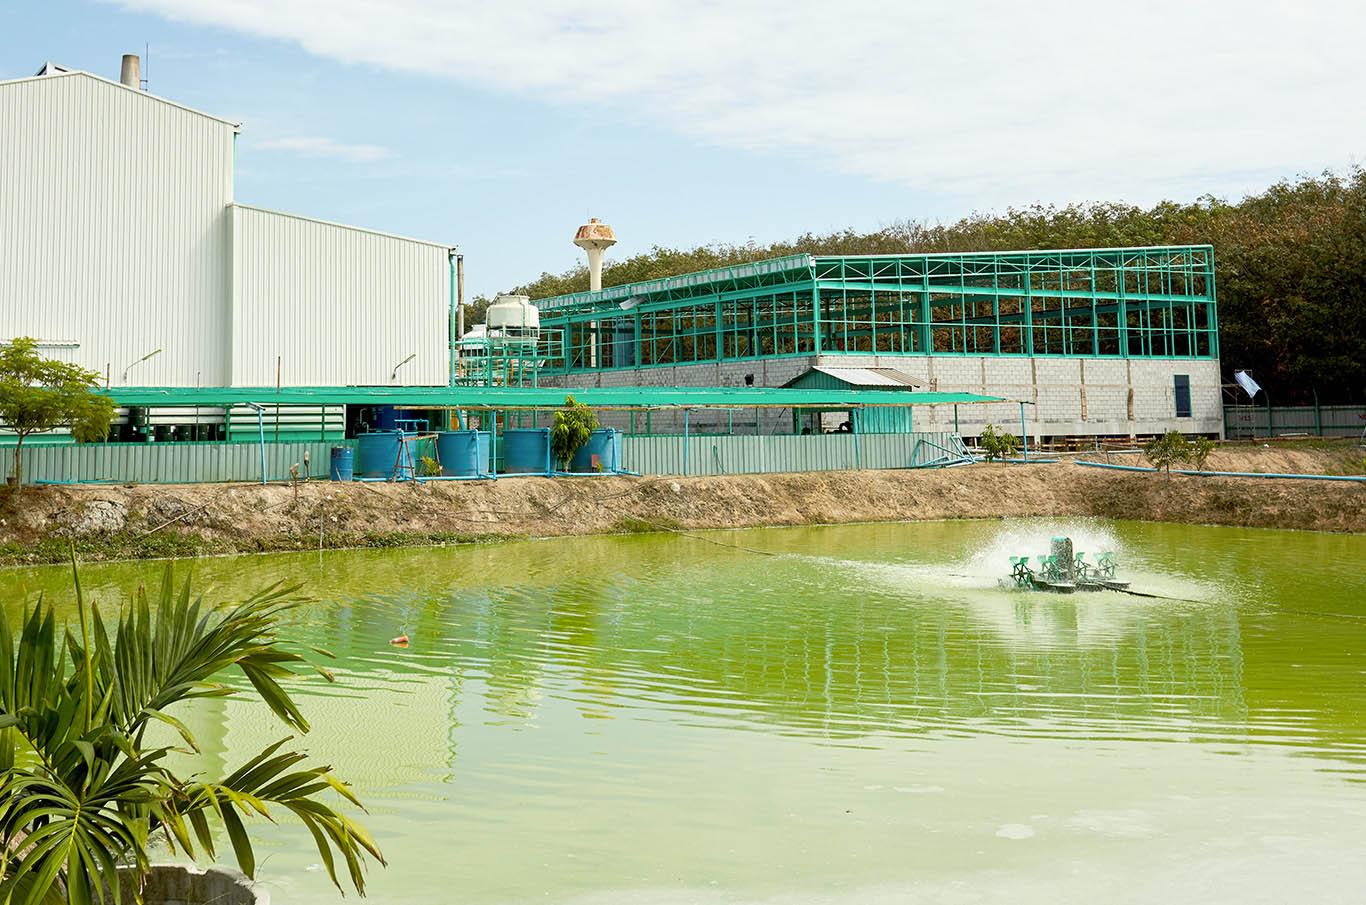 Sustainability, water treatment facilities, biomass boilers, palm kernels, water treatment plants, environment friendly, green, sustainable การพัฒนาอย่างยั่งยืน, บ่อน้ำเสีย, บ่อบำบัดน้ำเสีย,boiler ชีวมวล, ระบบบำบัดน้ำ, ระบบบำบัดน้ำอุตสาหกรรม